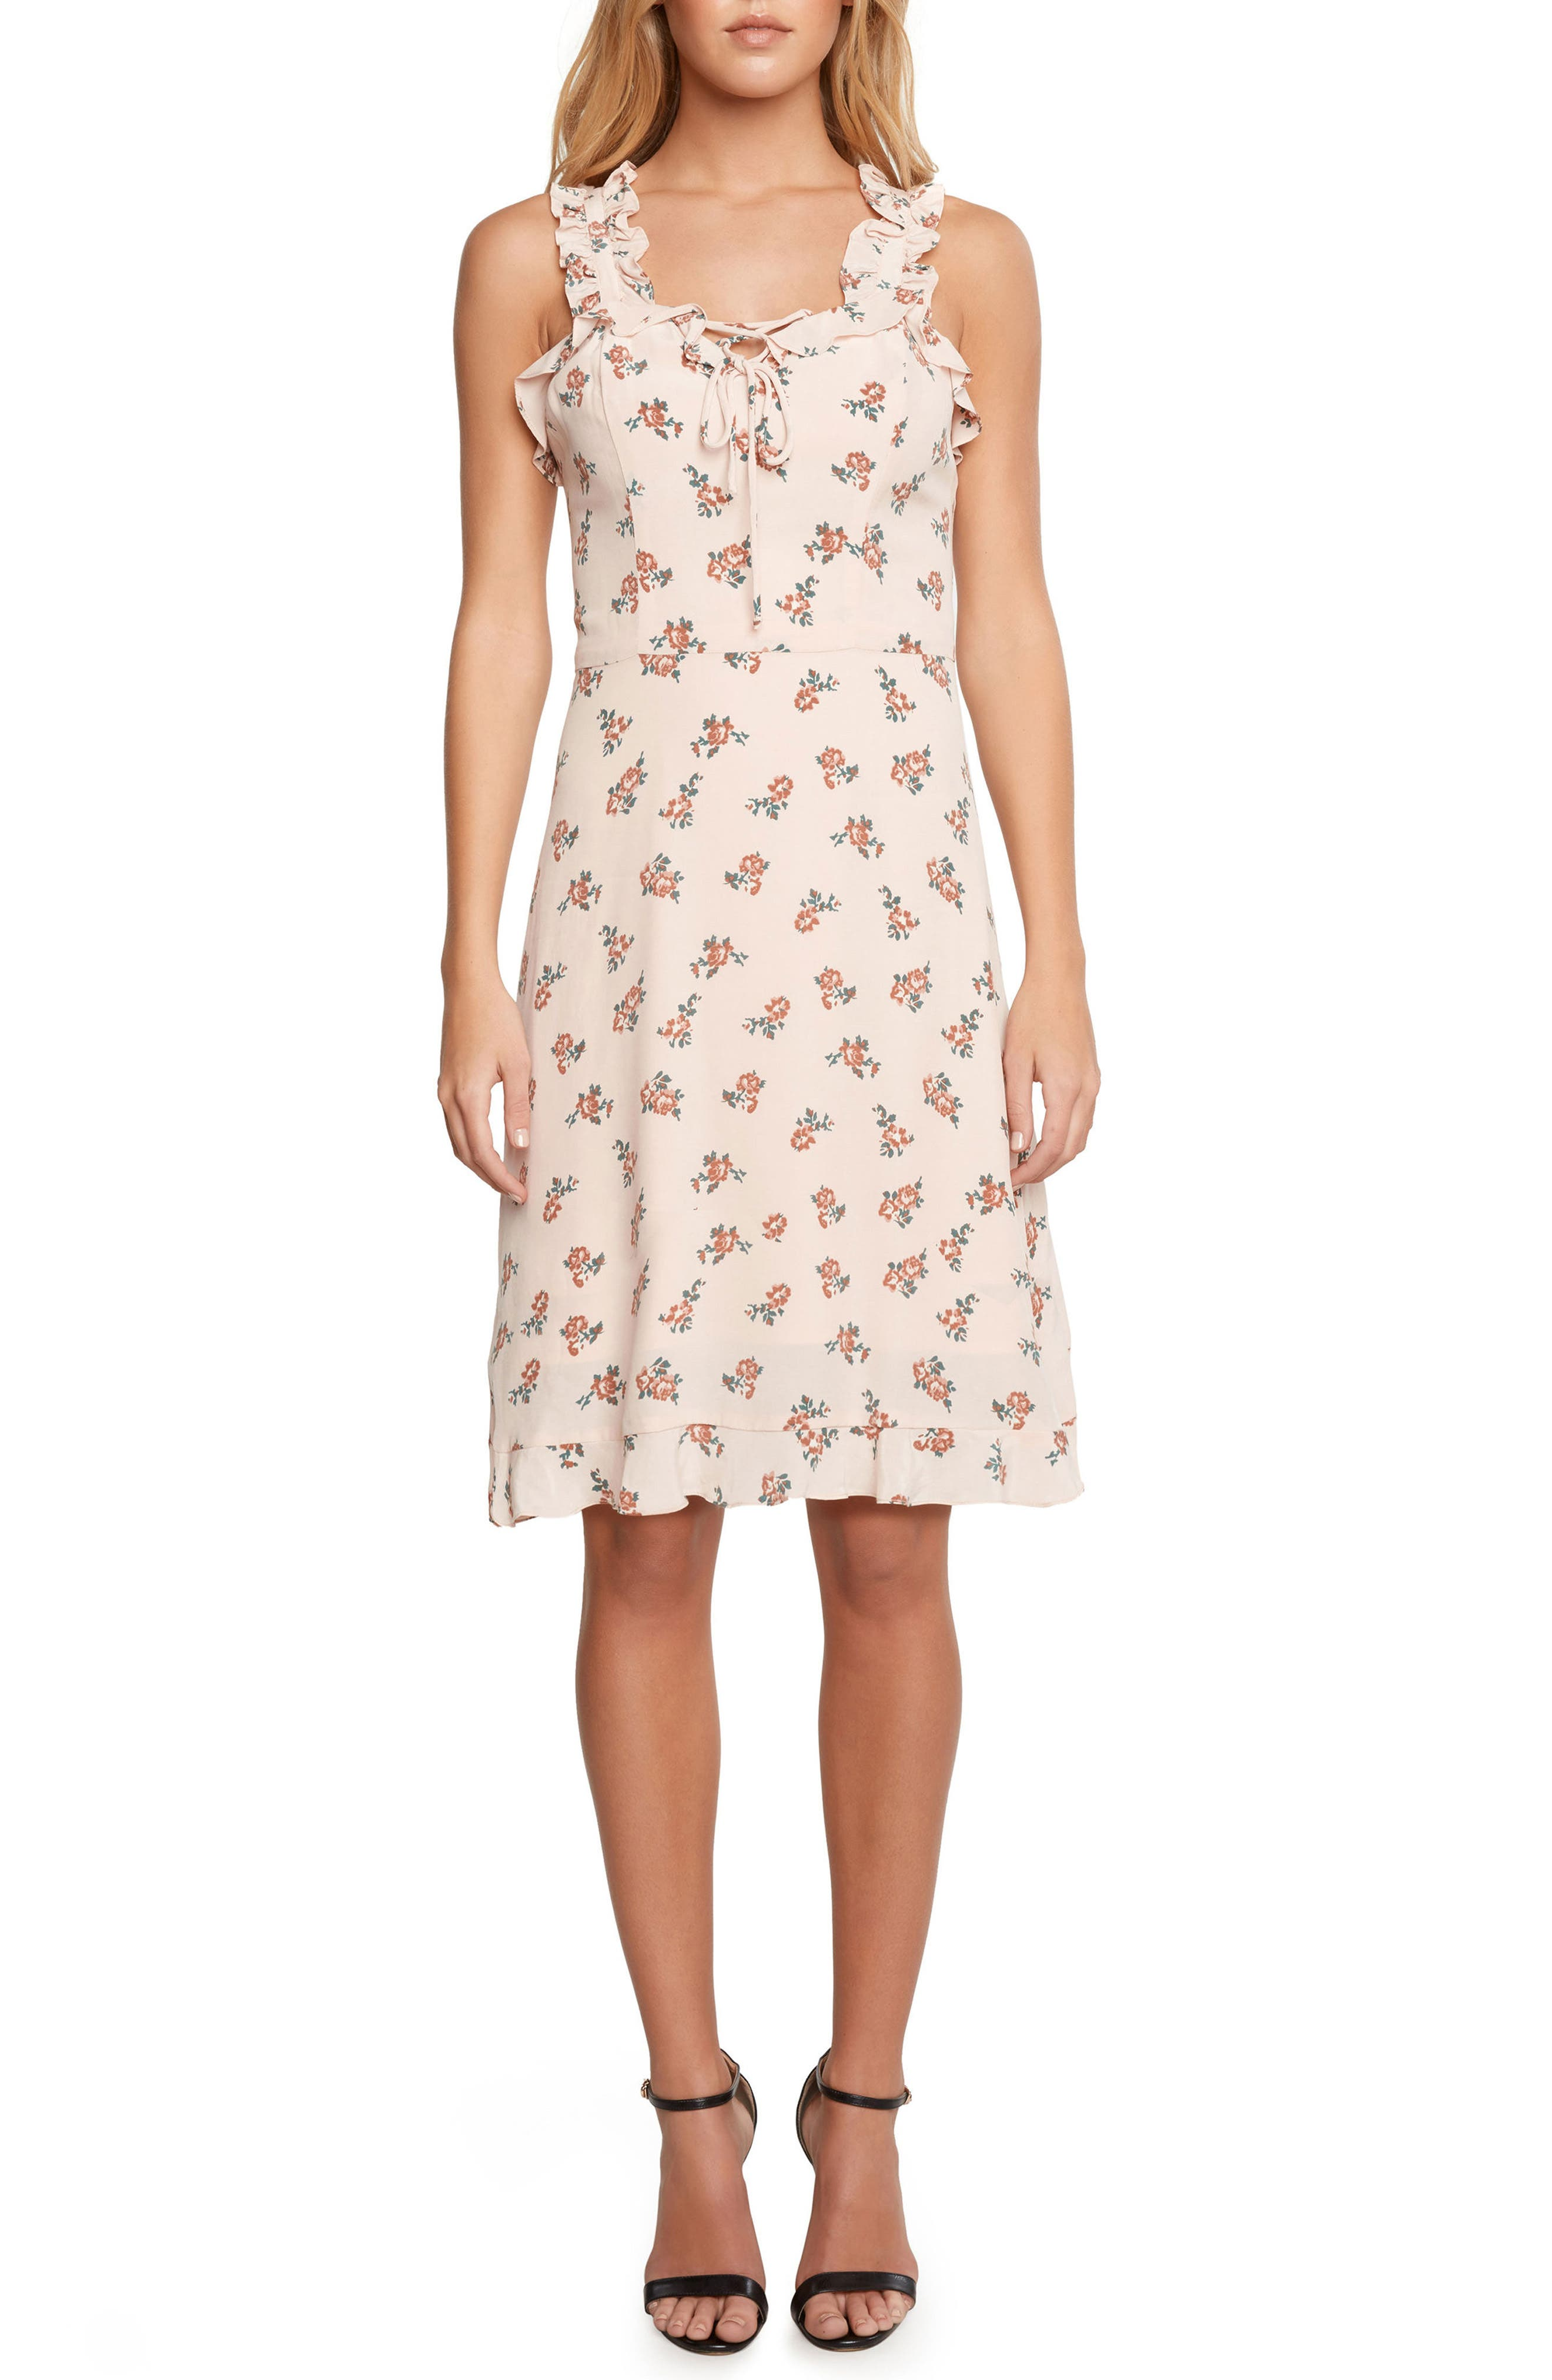 Ruffle Dress,                             Main thumbnail 1, color,                             950